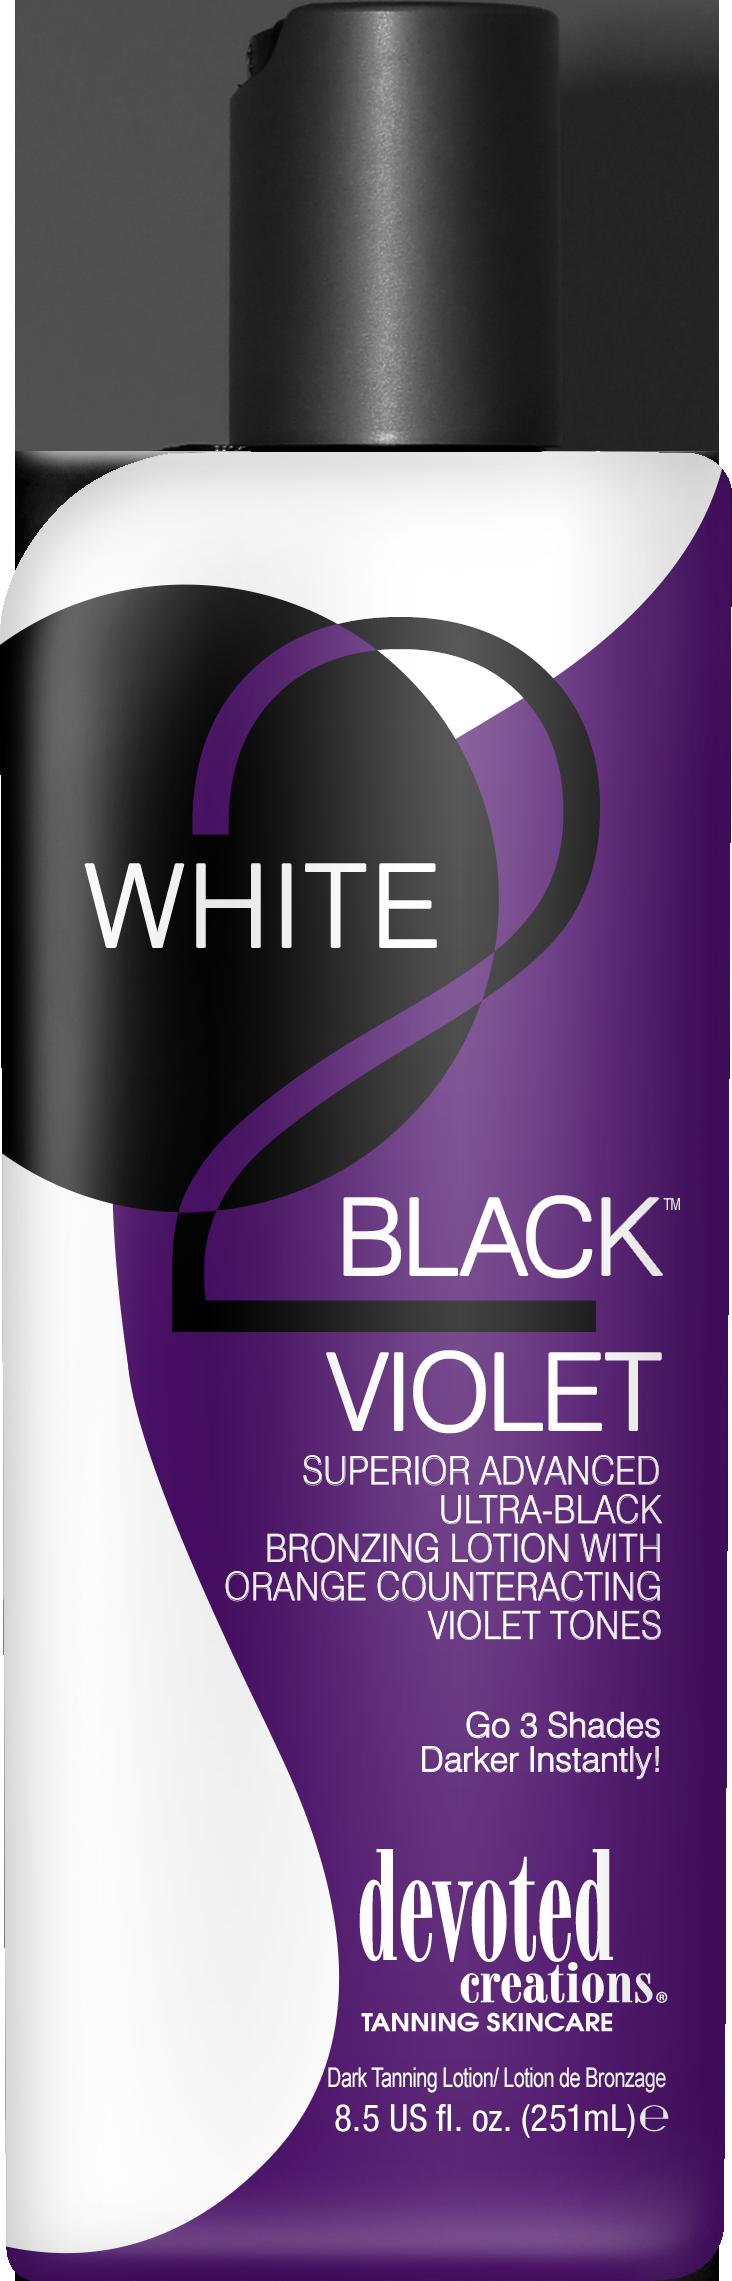 White 2 Black™ Black Violet